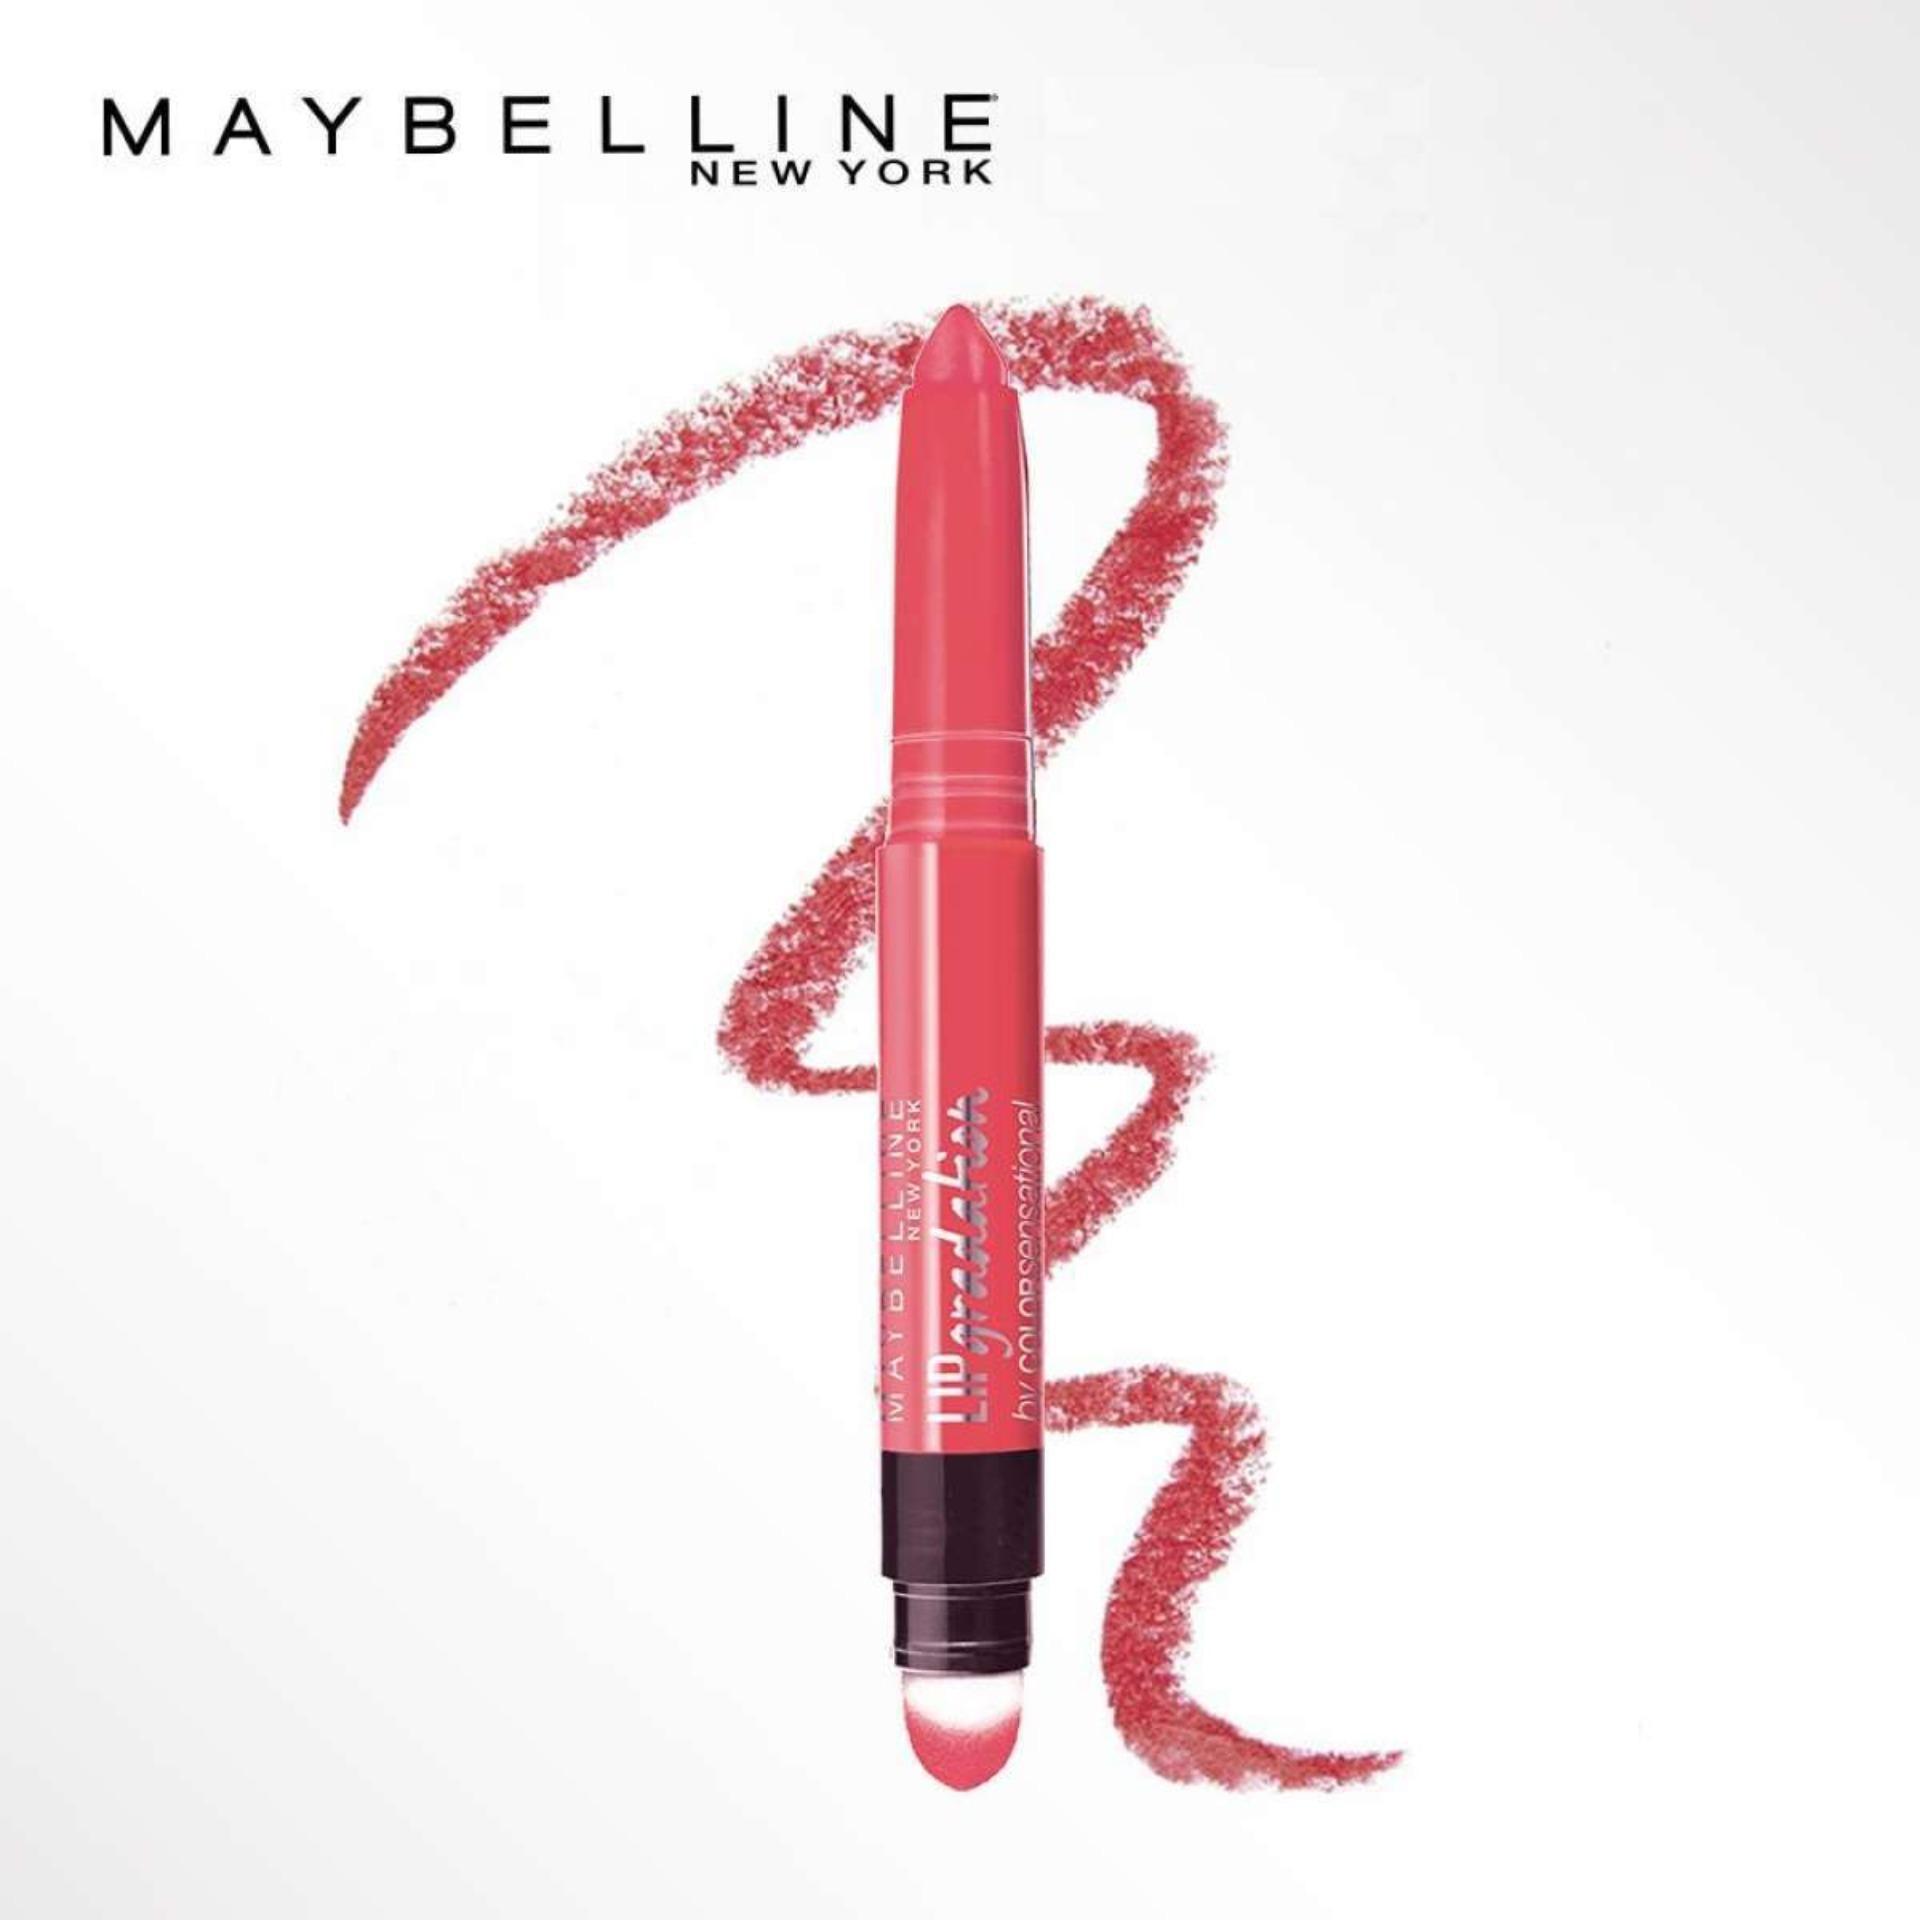 Maybelline Color Sensational Lip Gradation